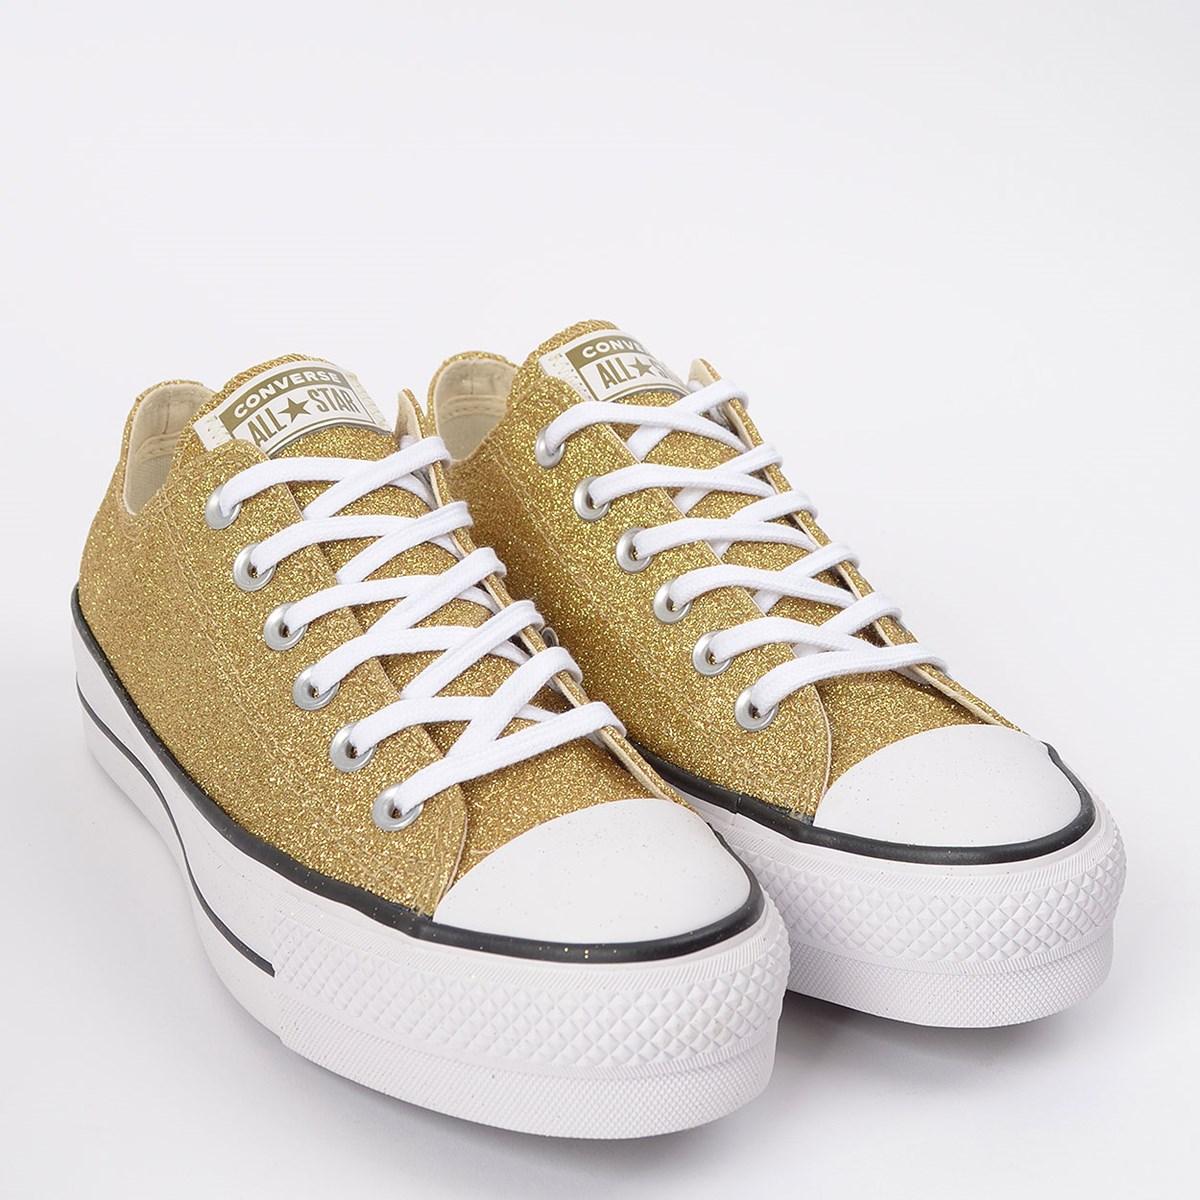 Tênis Converse Chuck Taylor All Star Platform Lift Ox Ouro Glitter CT14640002